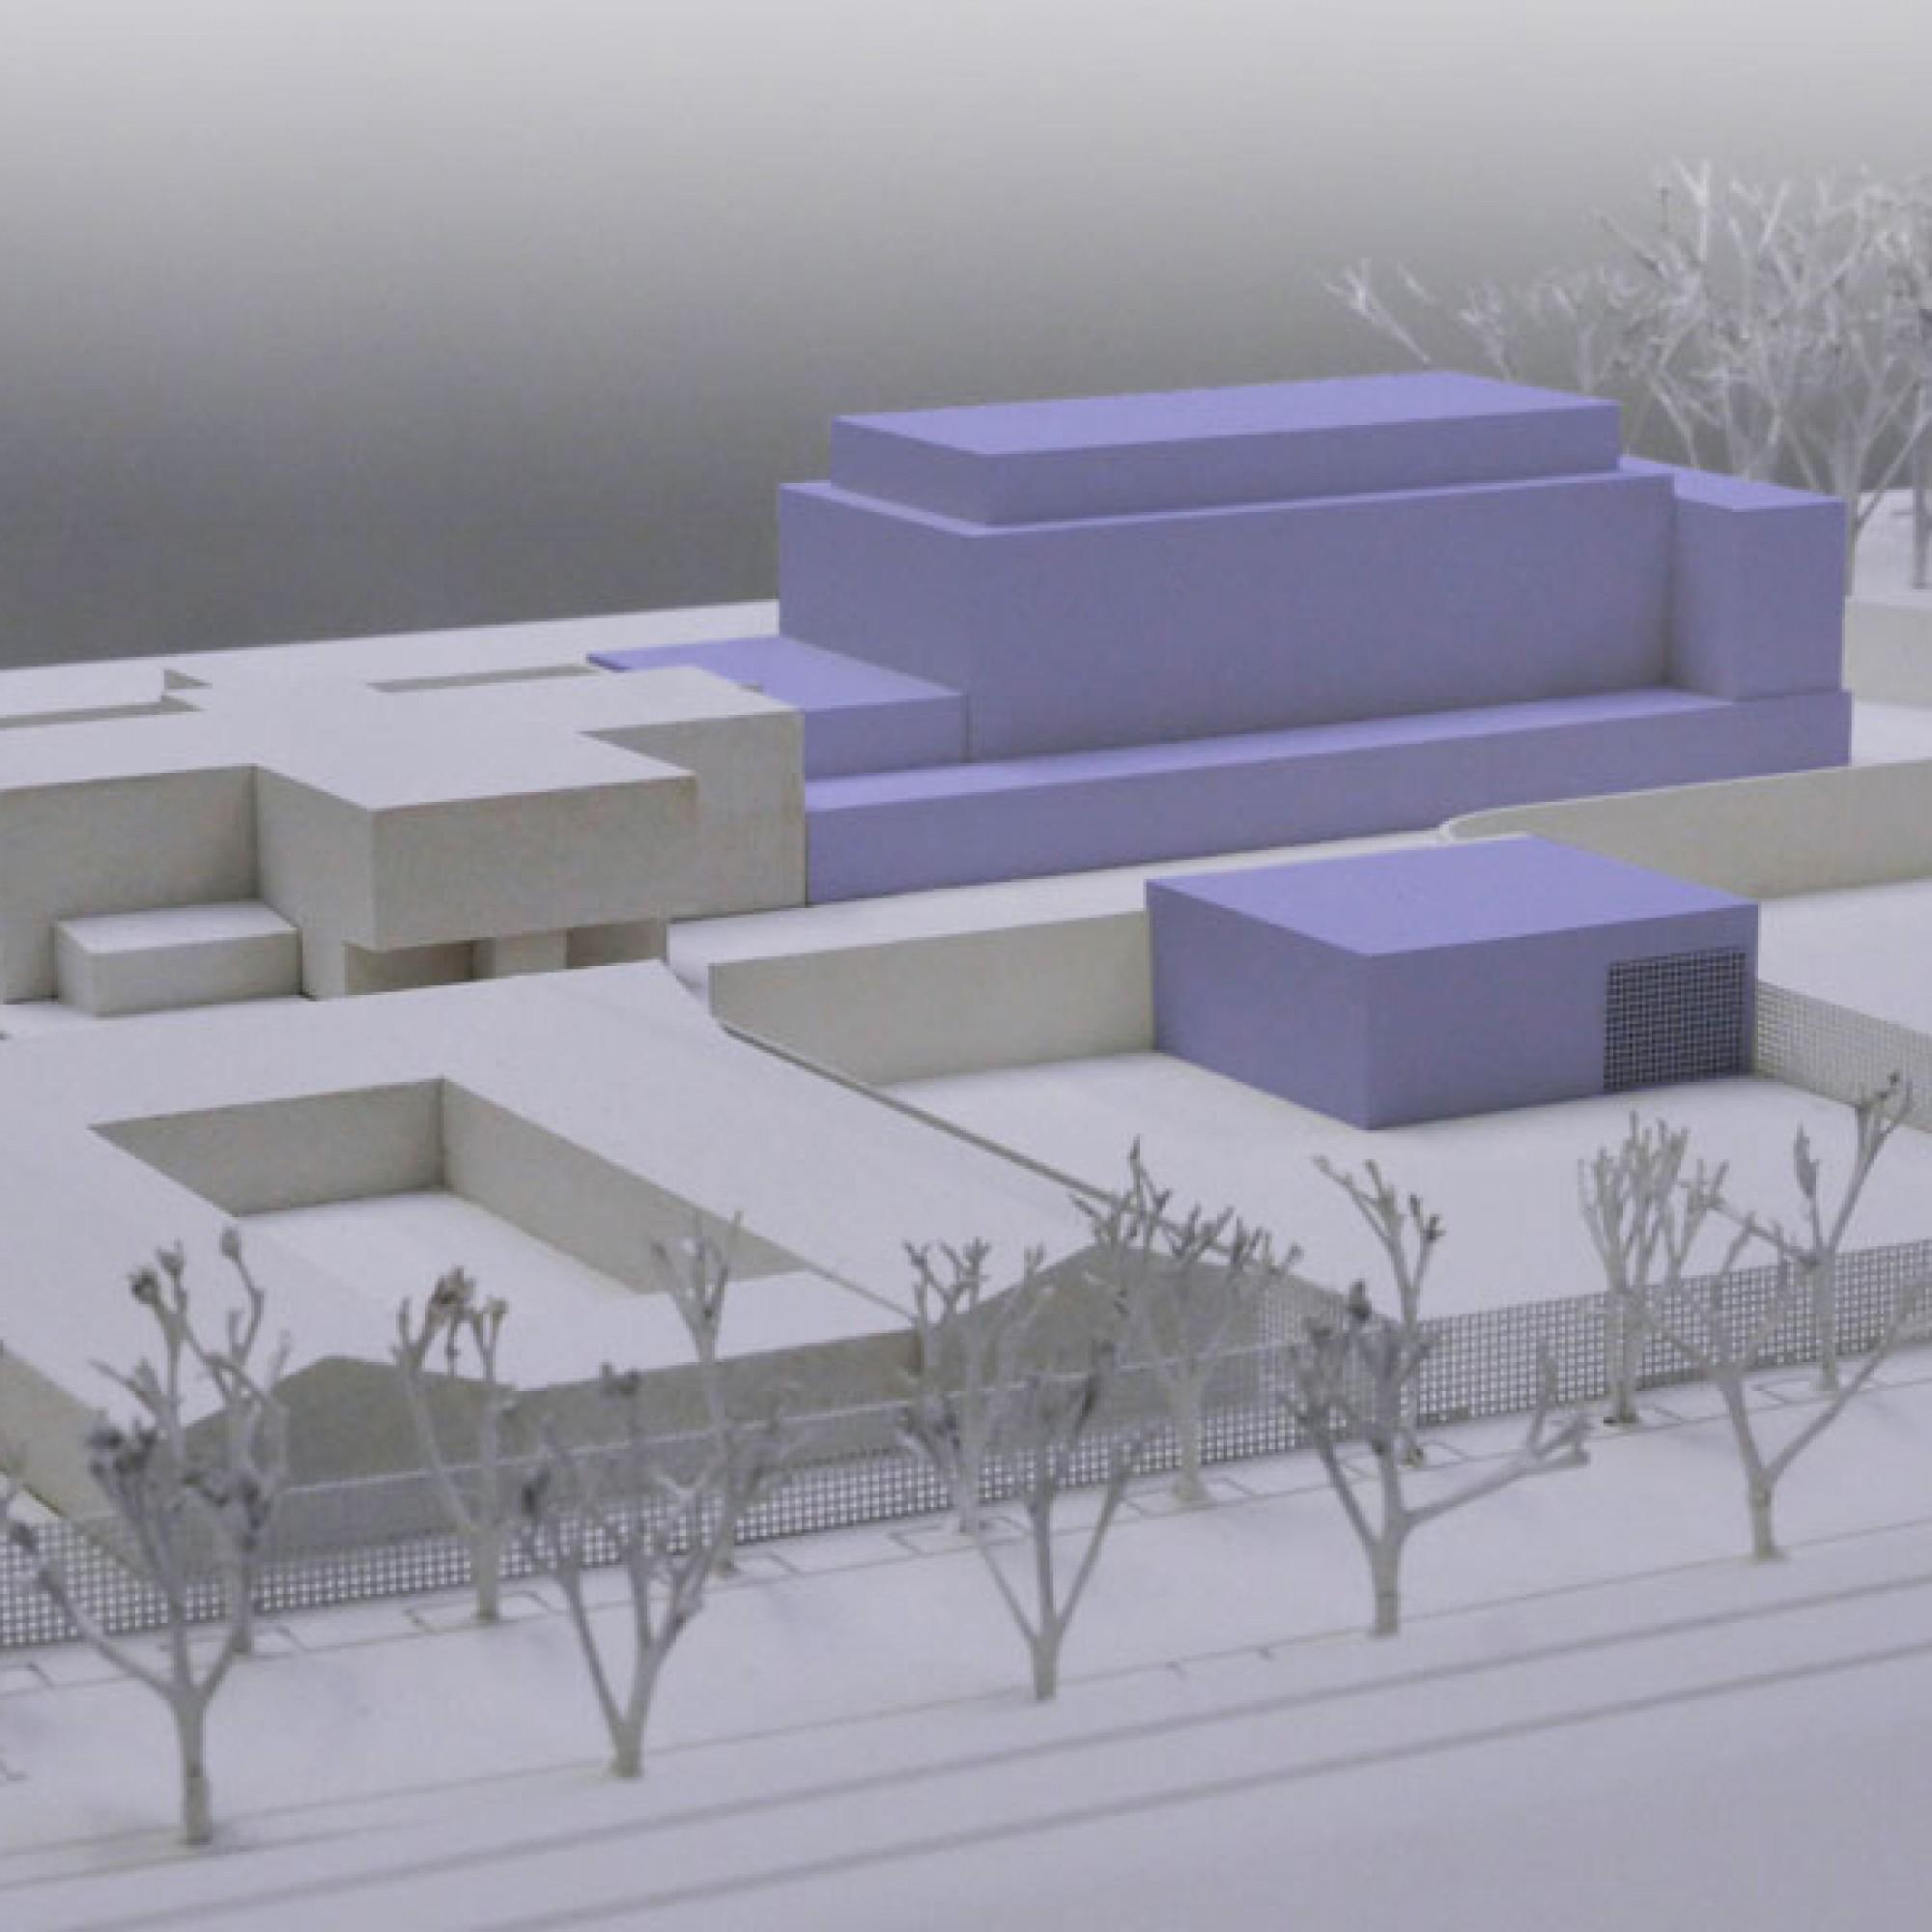 Basel plant einen Anbau an das Gefängnis Bässlergut bei der Grenze Otterbach (Modellbild JSD BS)